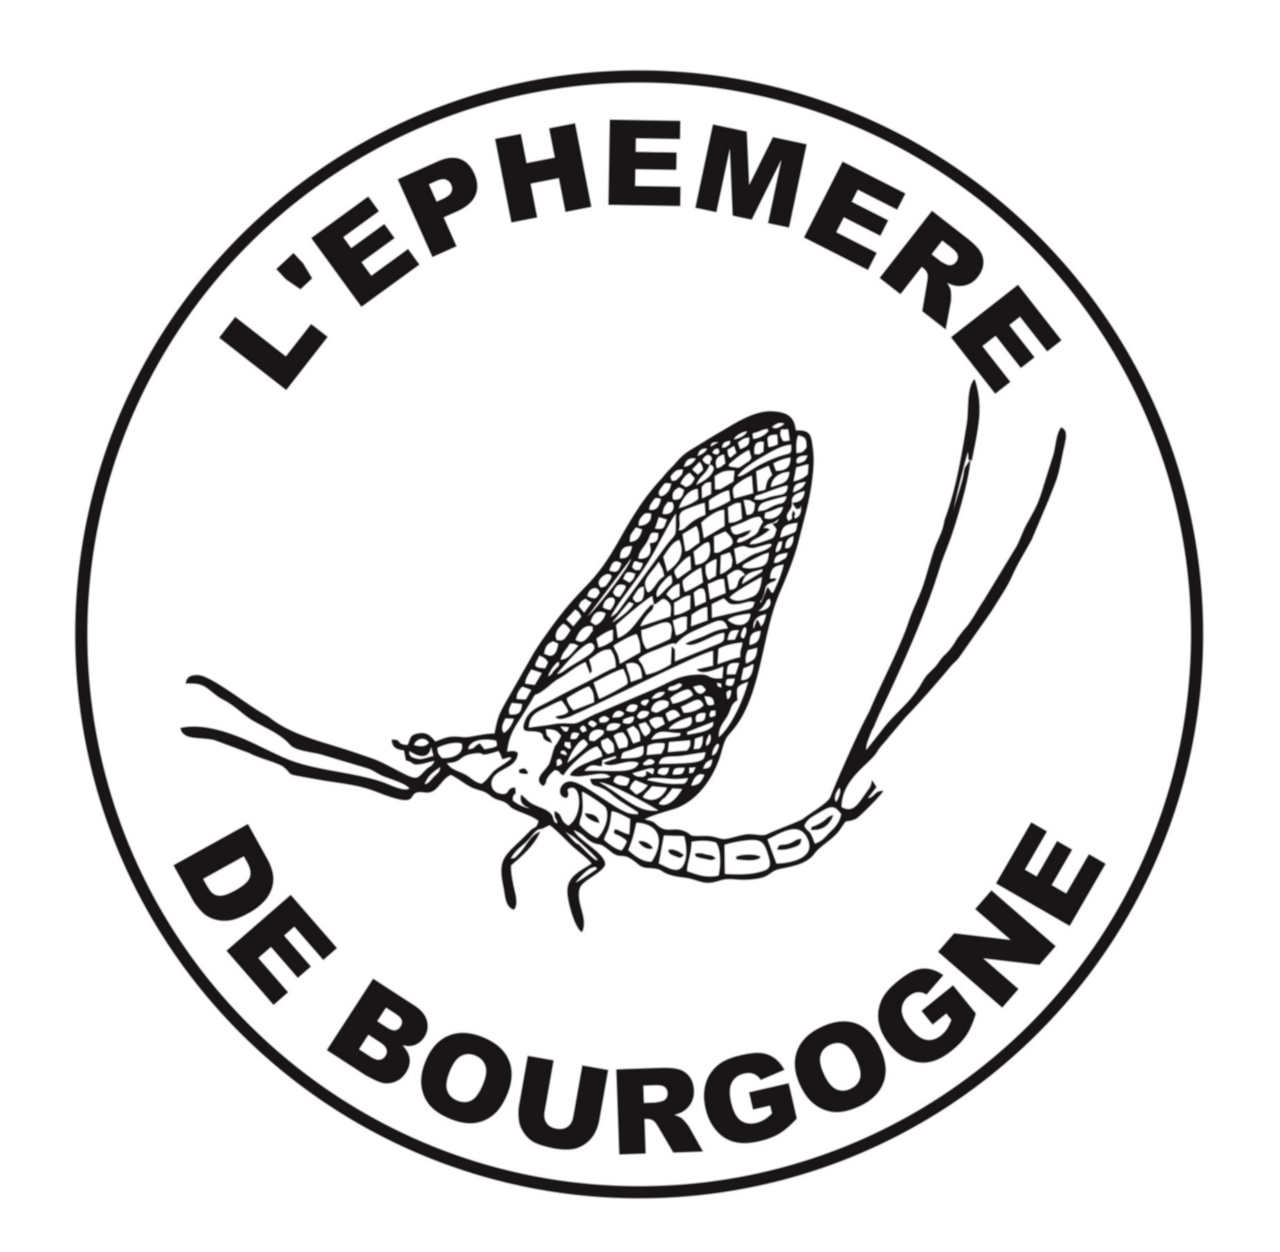 Ephemere de bourgogne